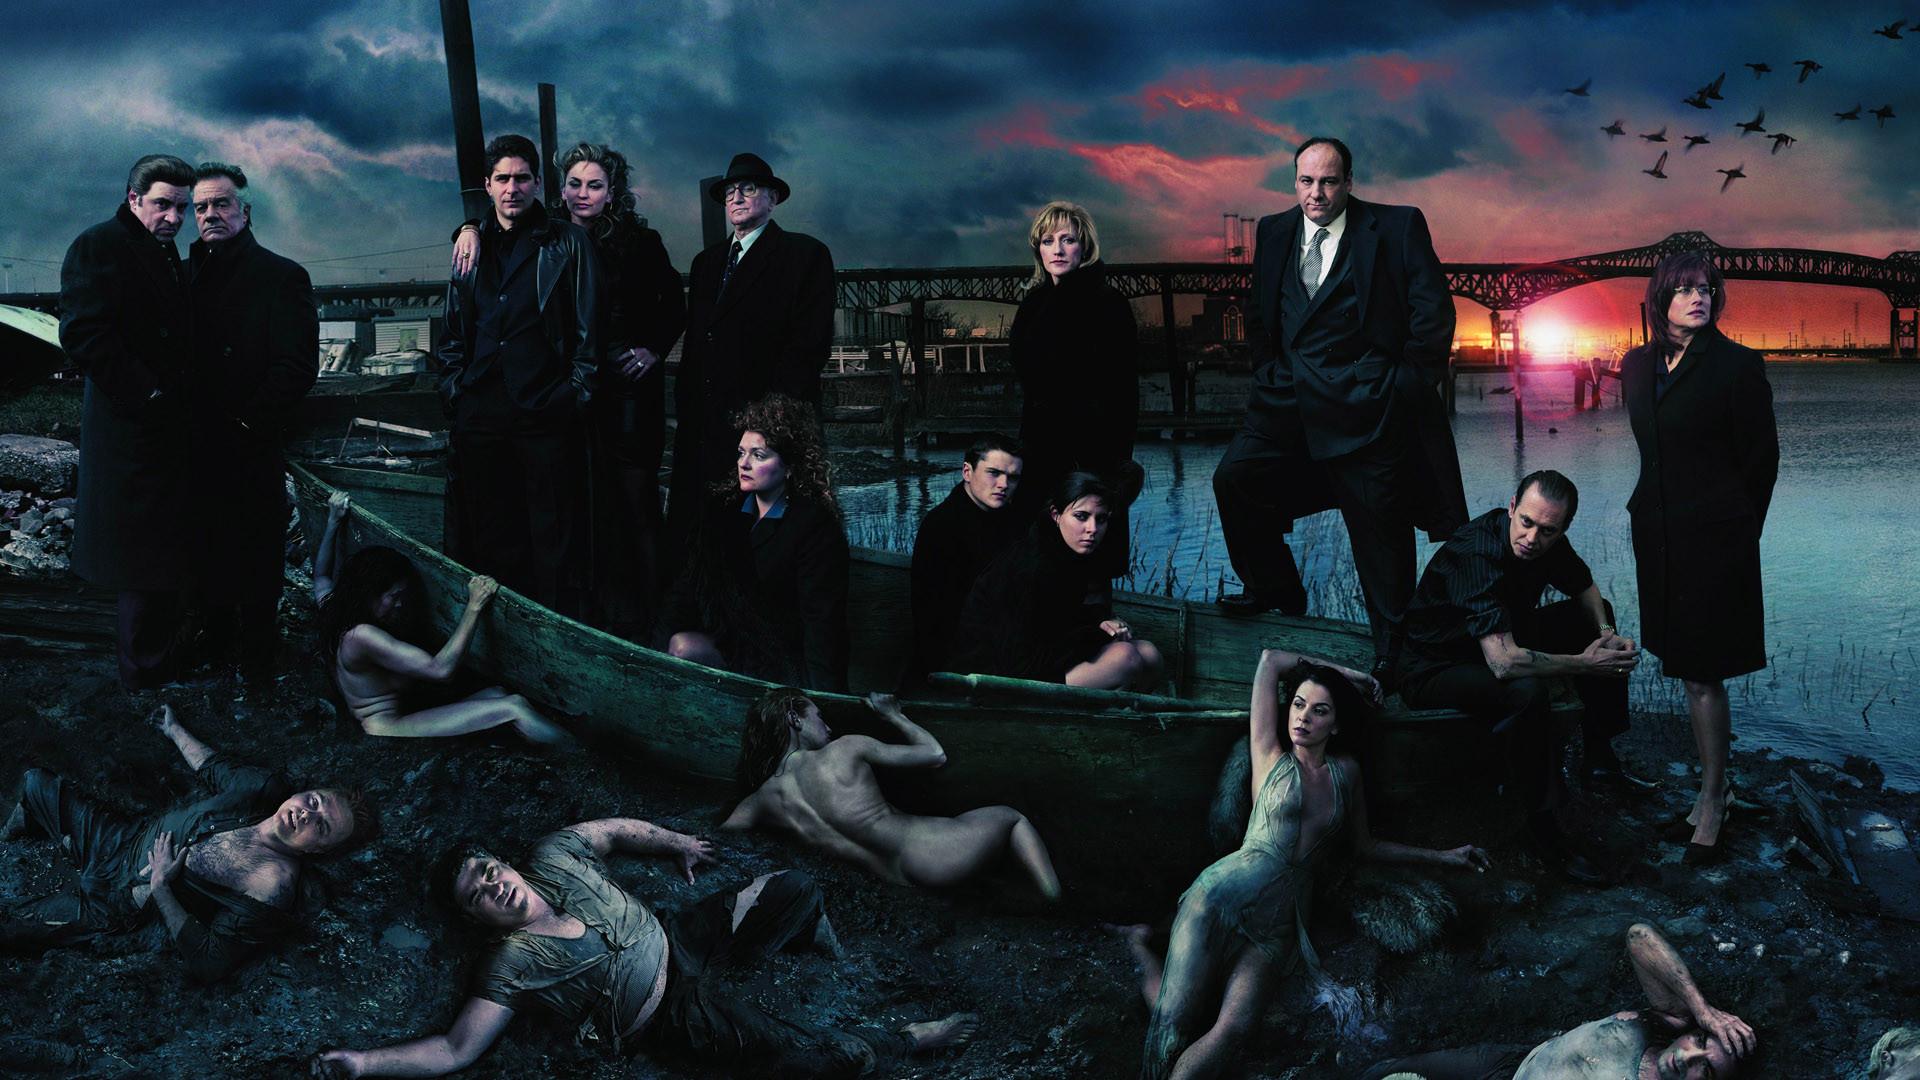 Swedish House Mafia Hd Wallpapers Mafia Wallpaper 69 Images